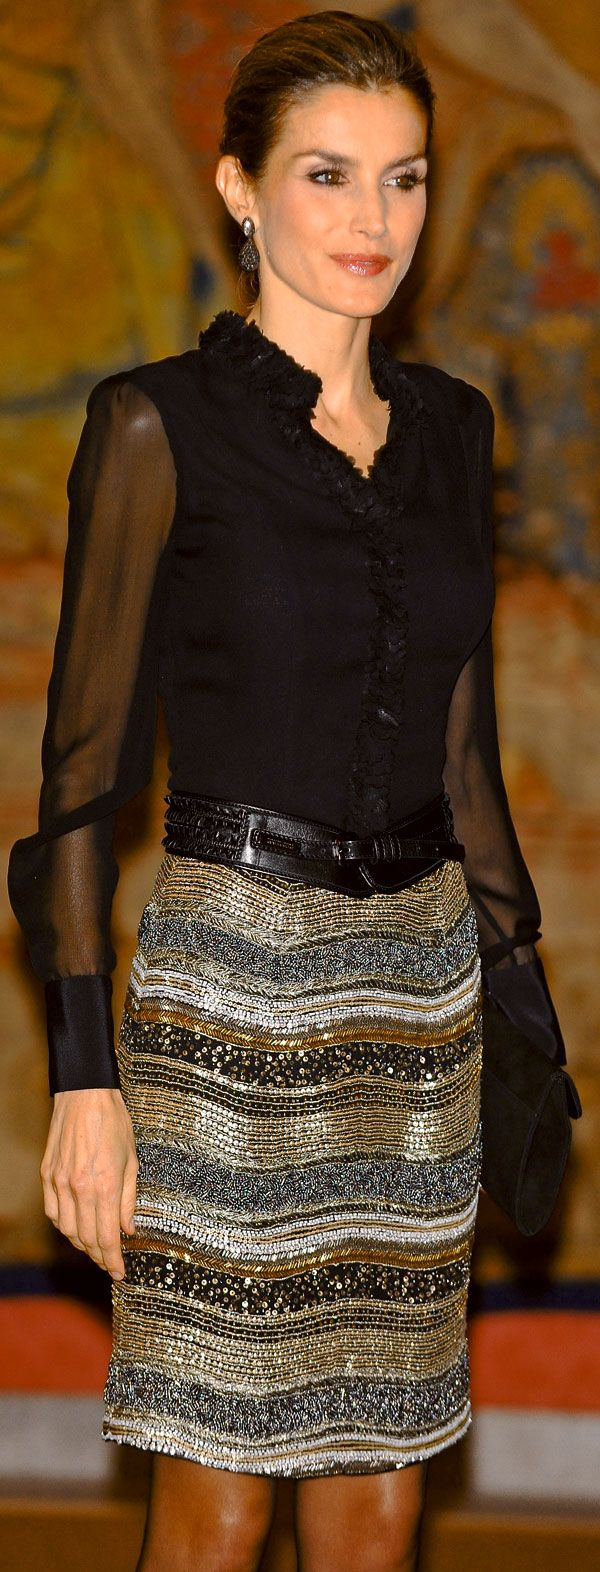 Mistura de texturas + transparencia na medida + cintura marcada + caimento ajustado